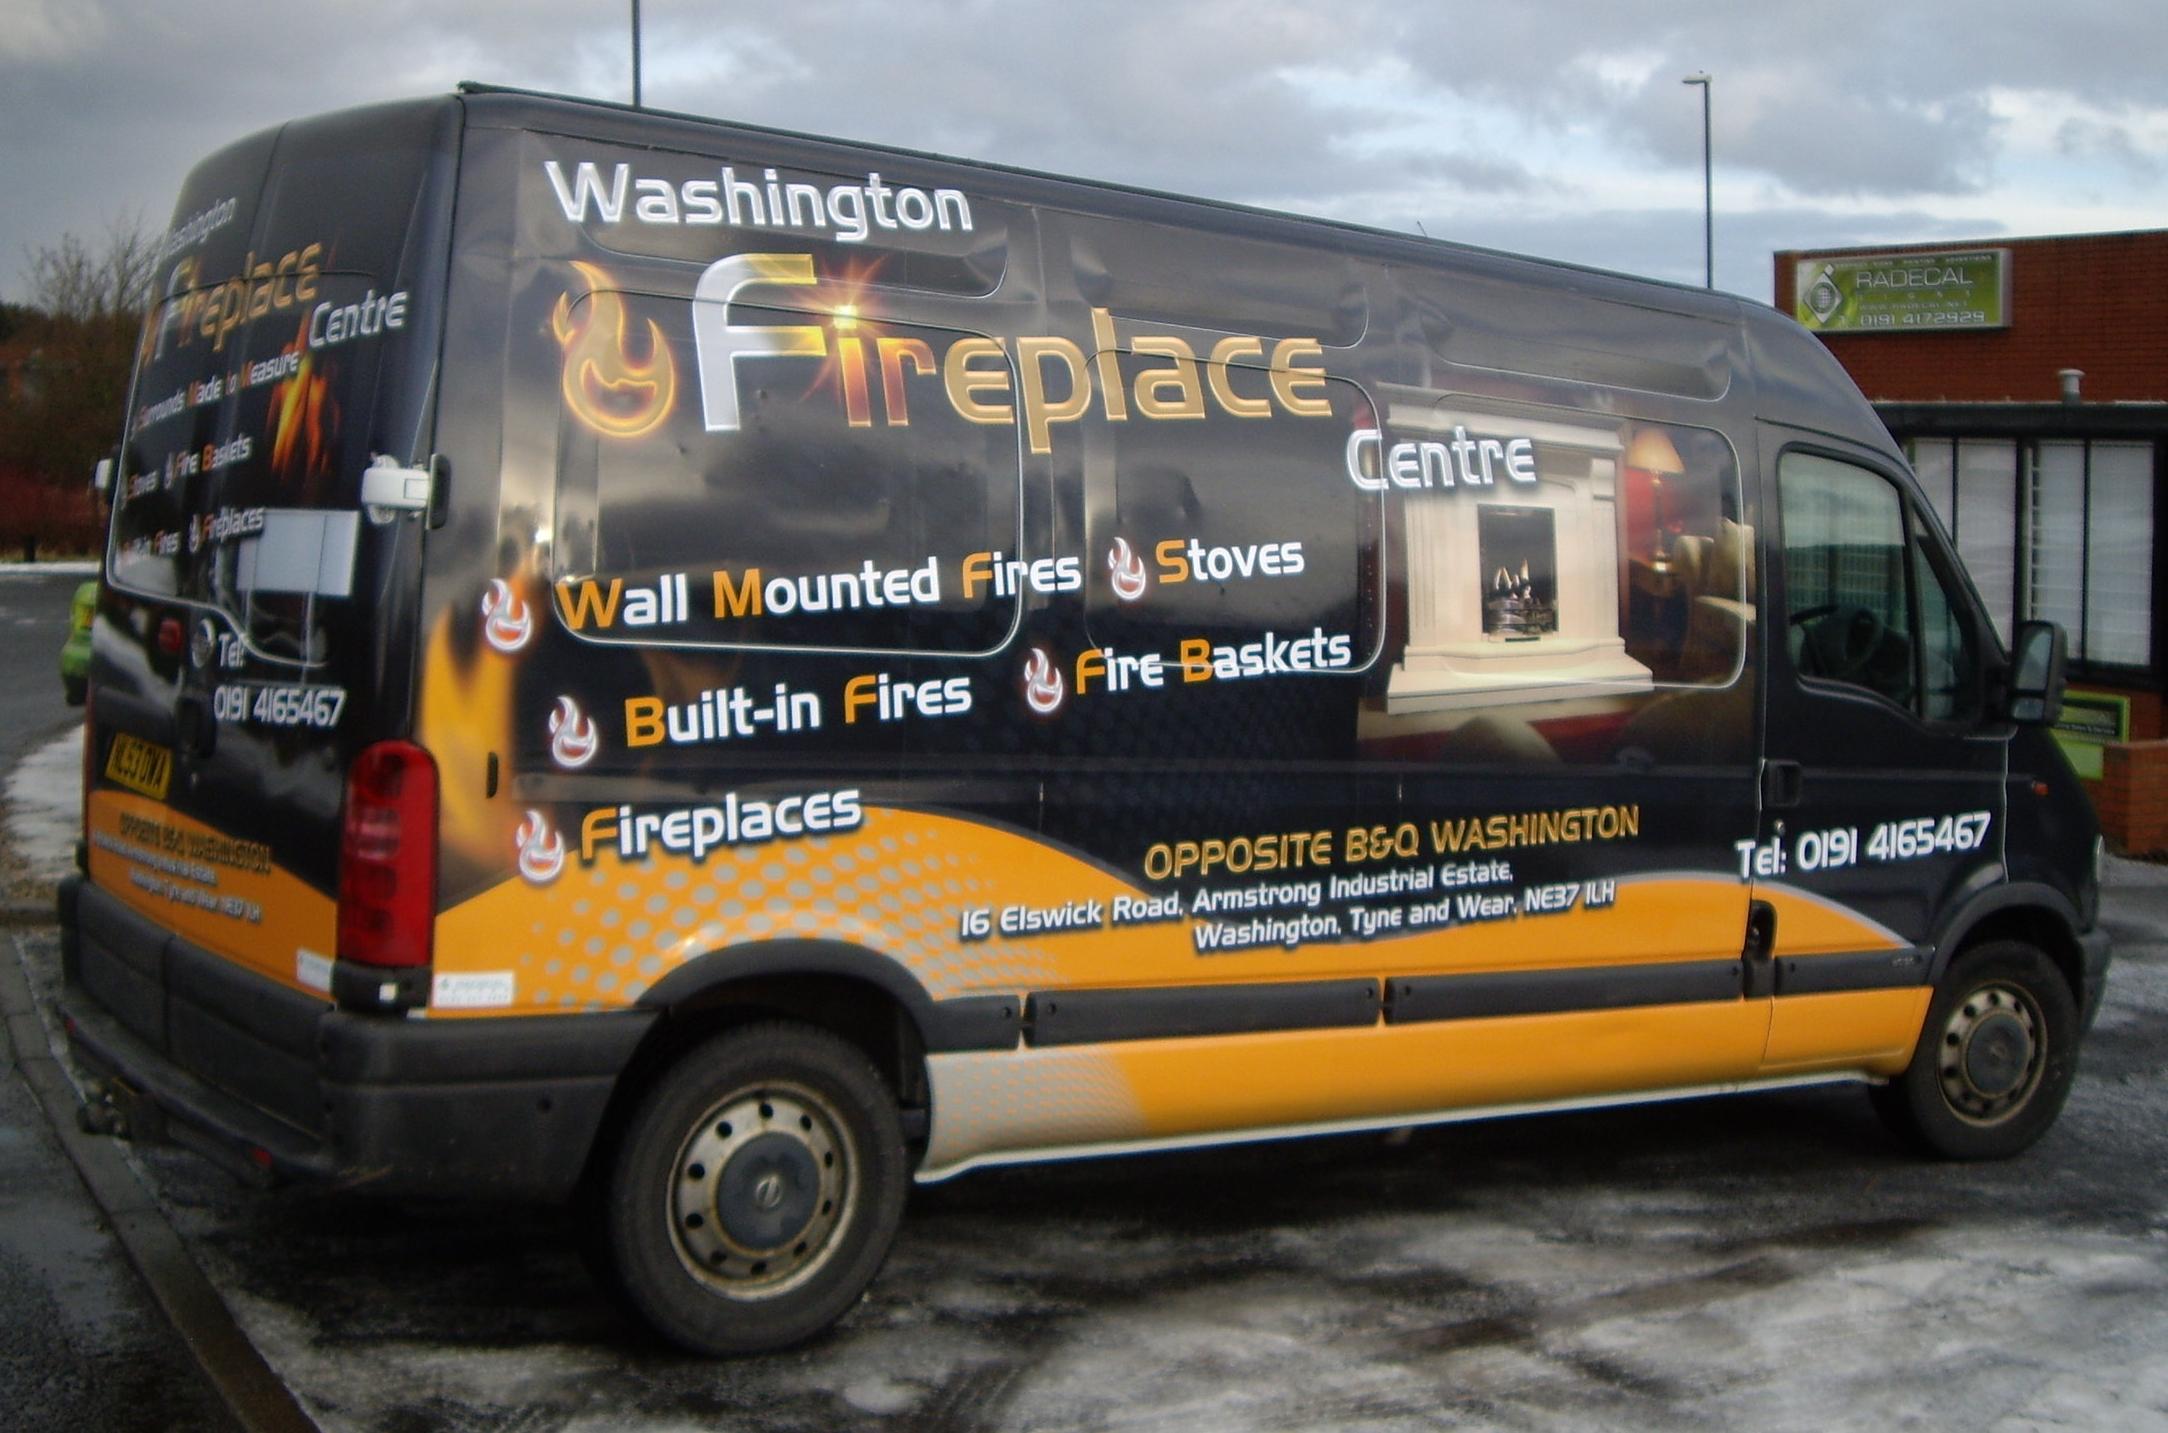 WASHINGTON FIREPLACE CENTRE   Full van wrap.